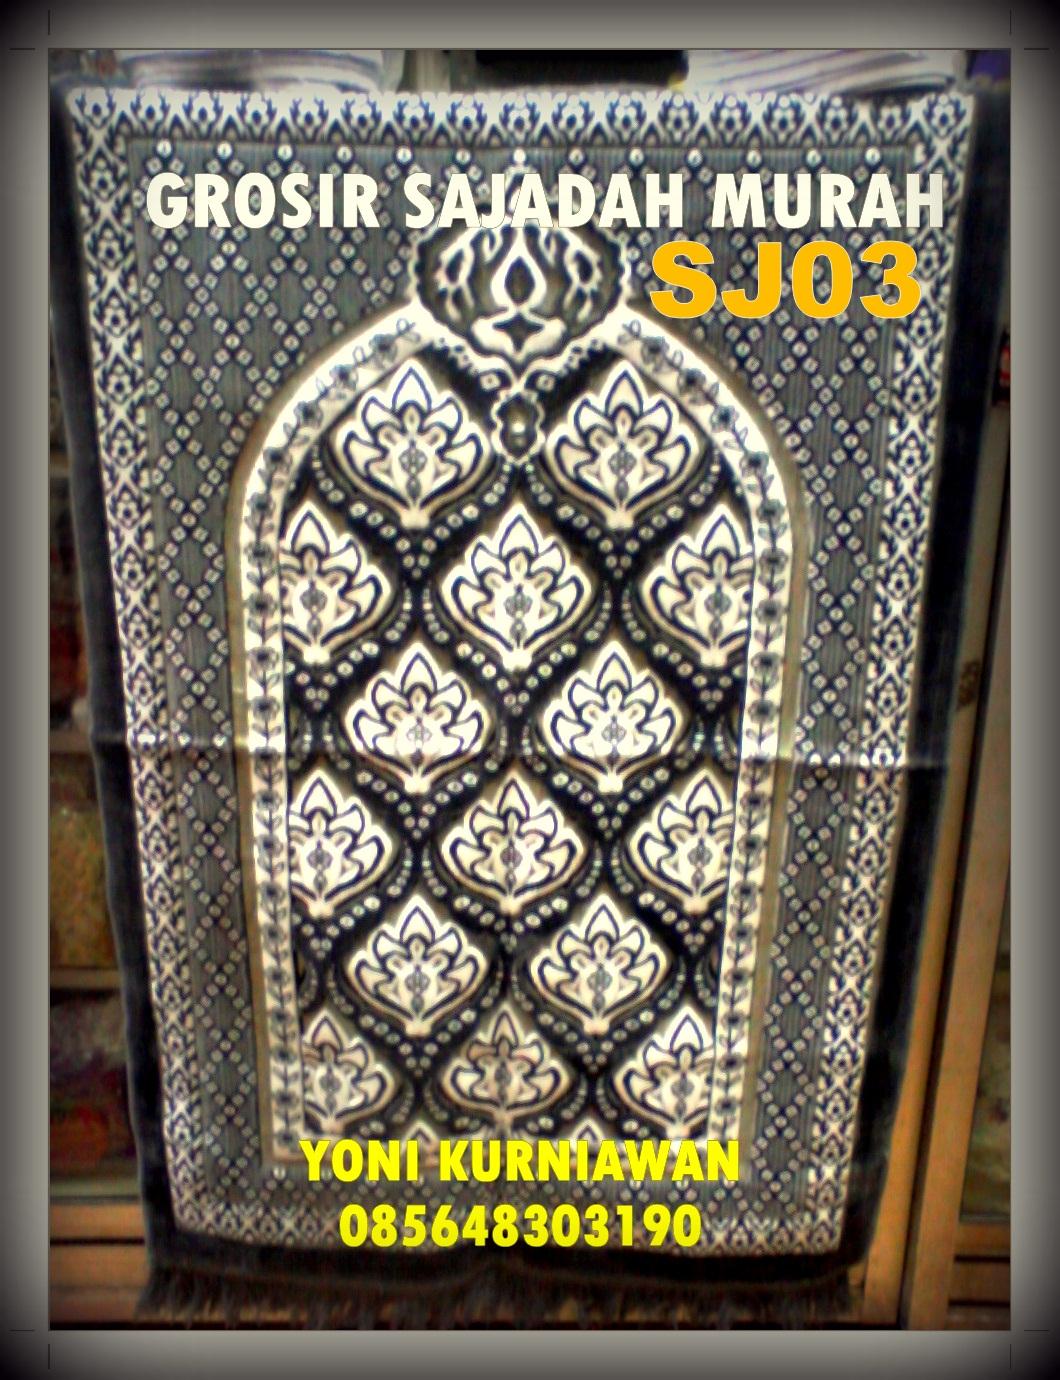 ... SAJADAH | Grosir Sajadah Murah Online – Distributor Sajadah Murah